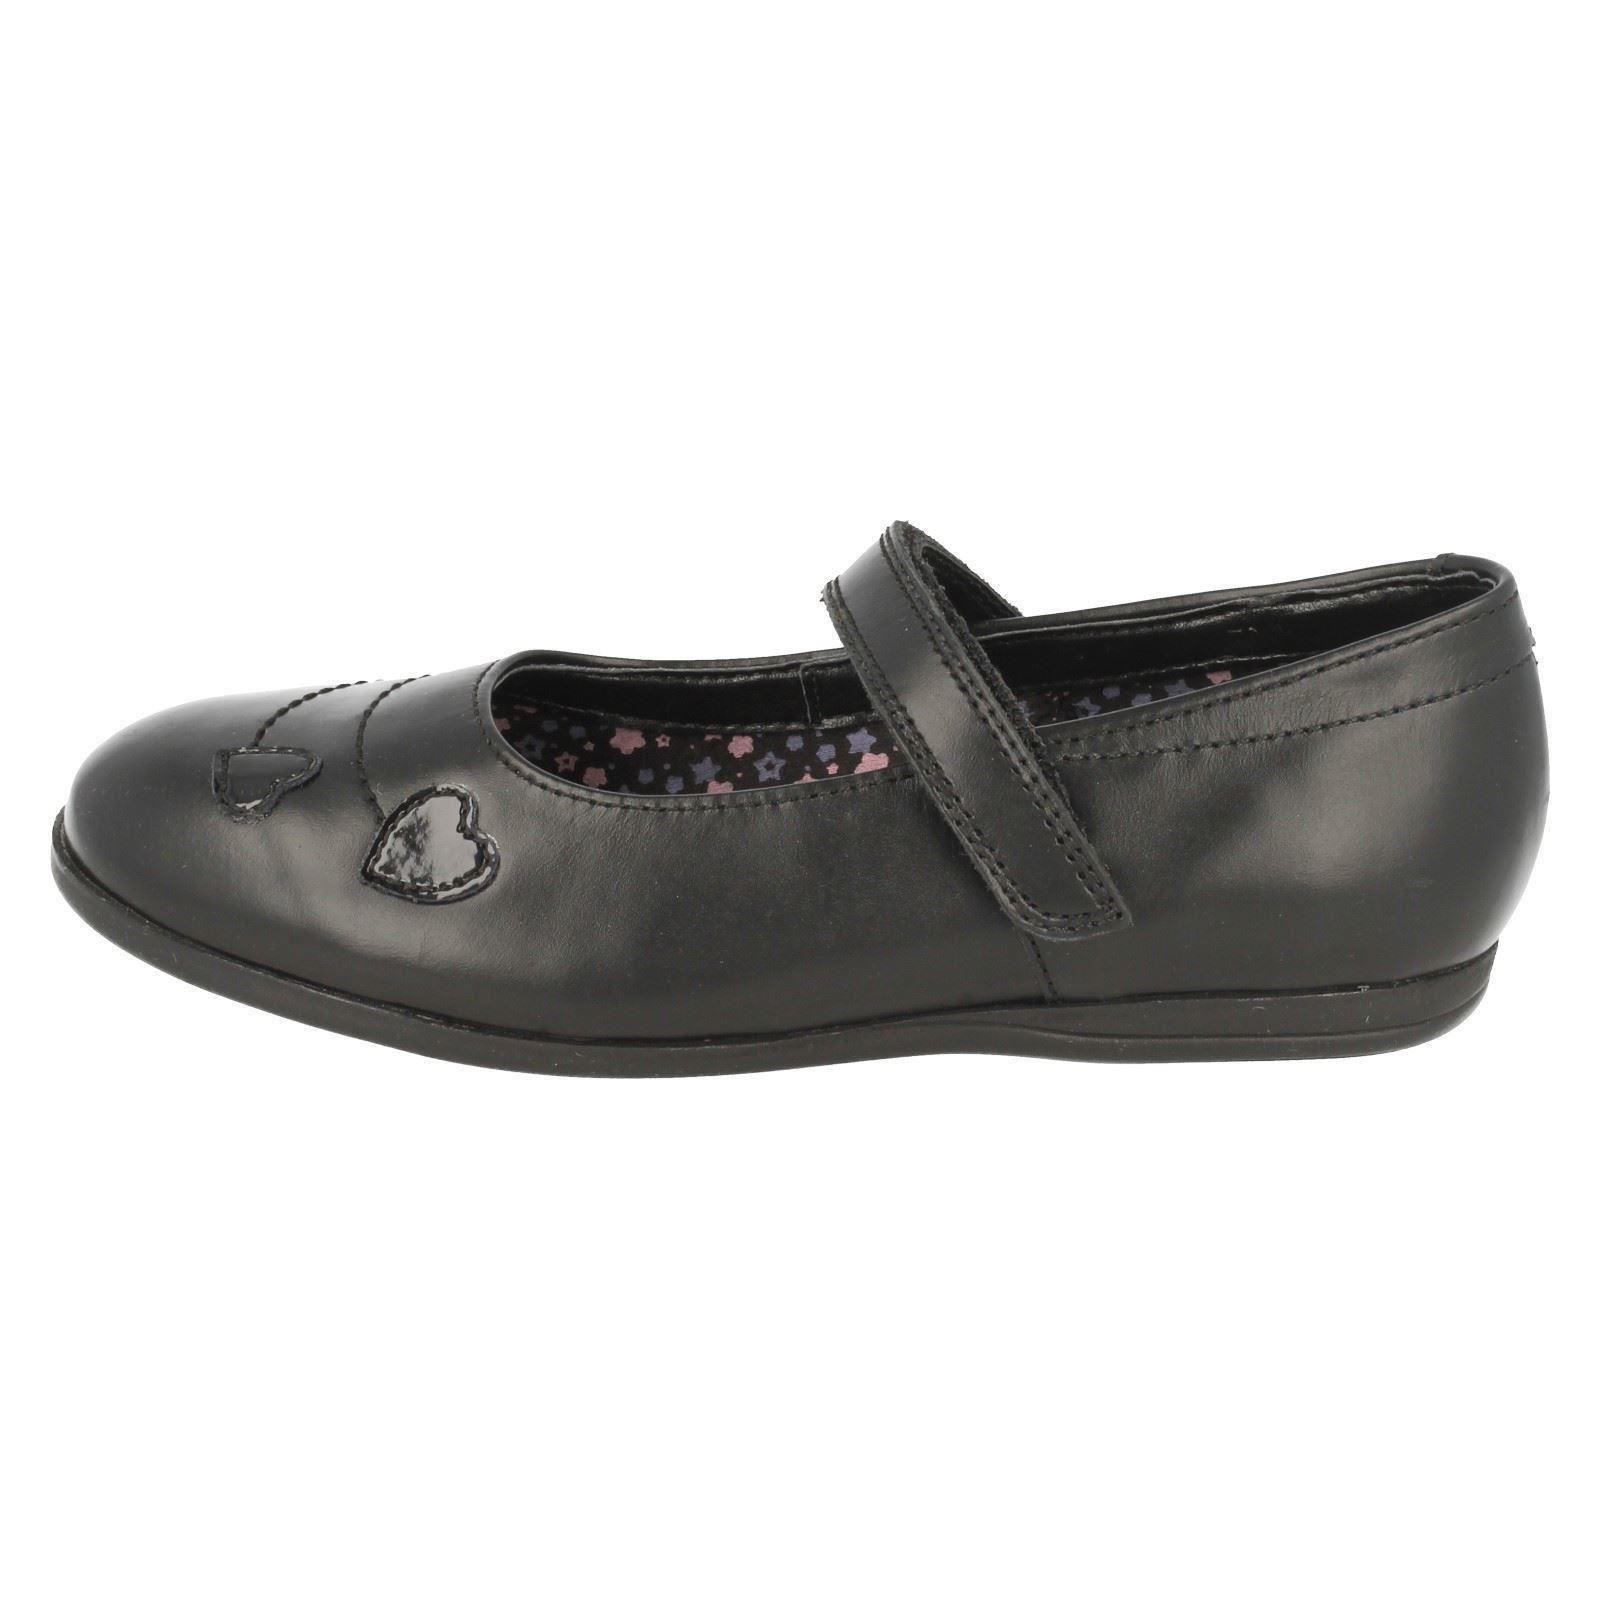 Niñas Startrite Formal/Zapatos Escolares Saskia